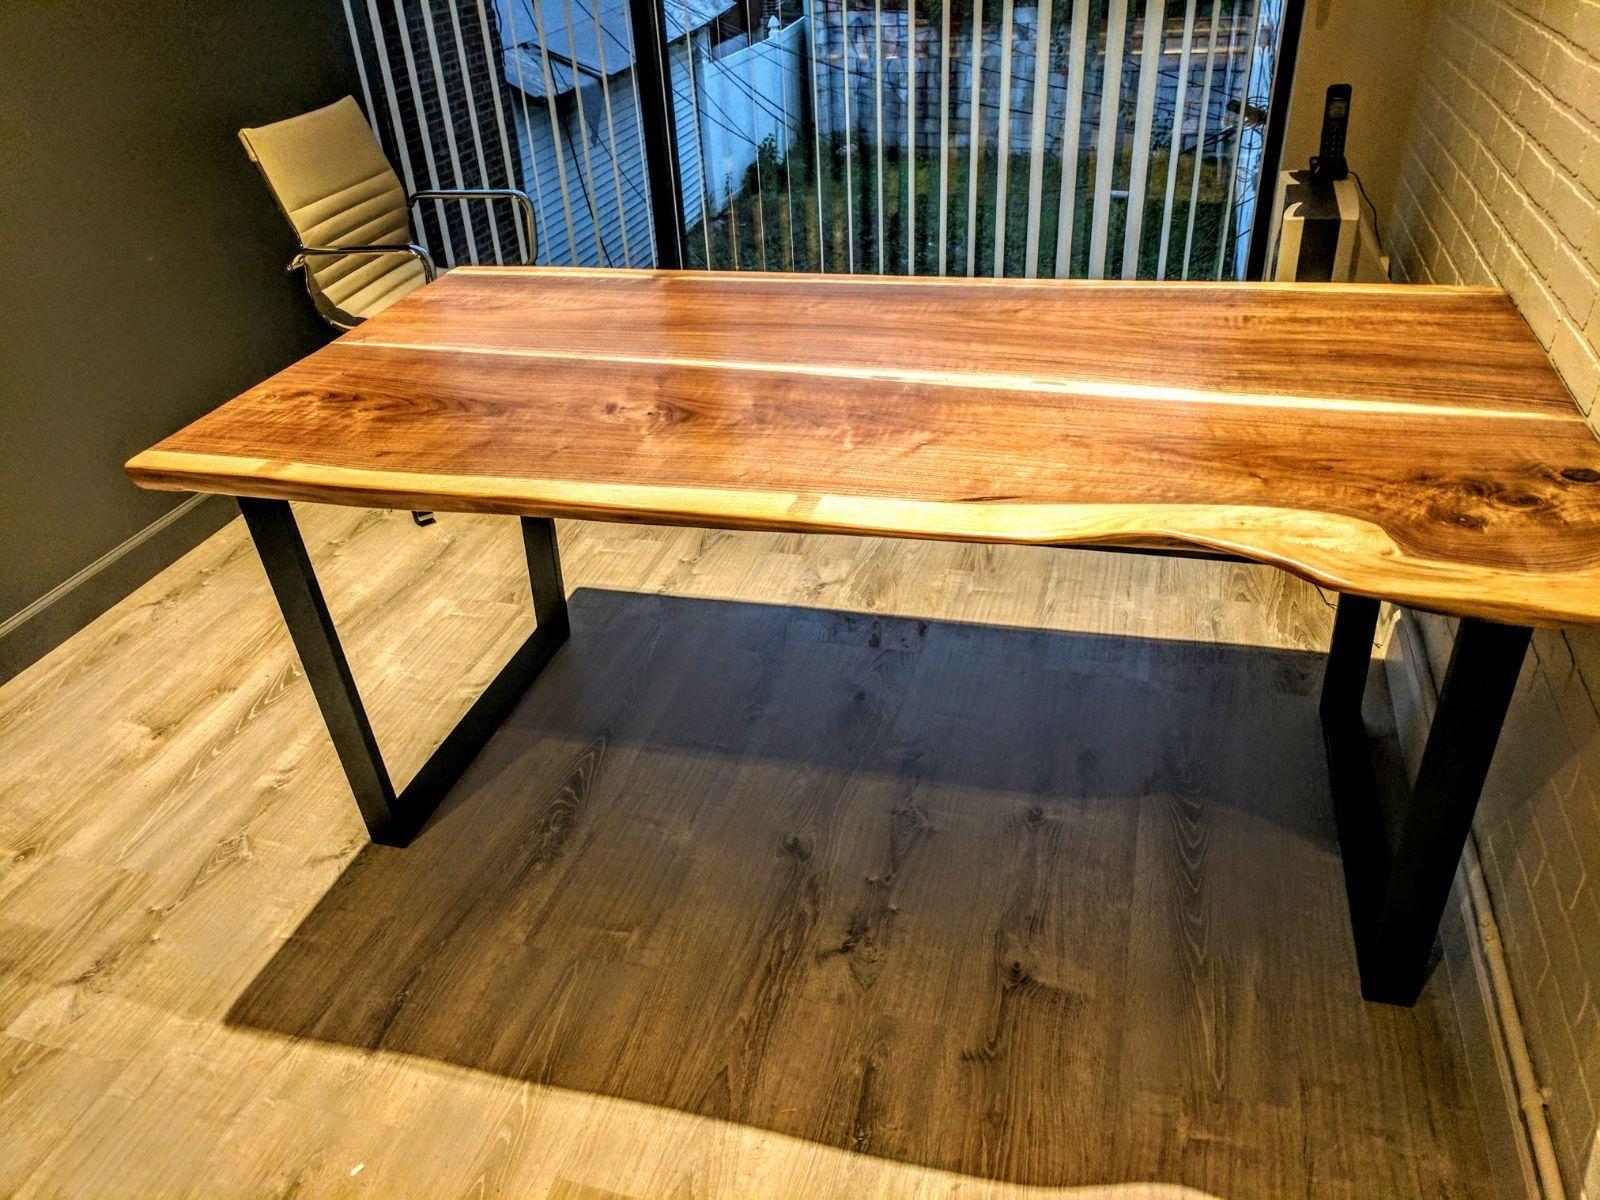 Custom Wood Tables Desk Tops New Jersey Nyc Wood Touch Llc Live Edge Tables Barn Wood Pergolas Beams And Mantels New Jersey Live Edge Wood Table Wooden Slab